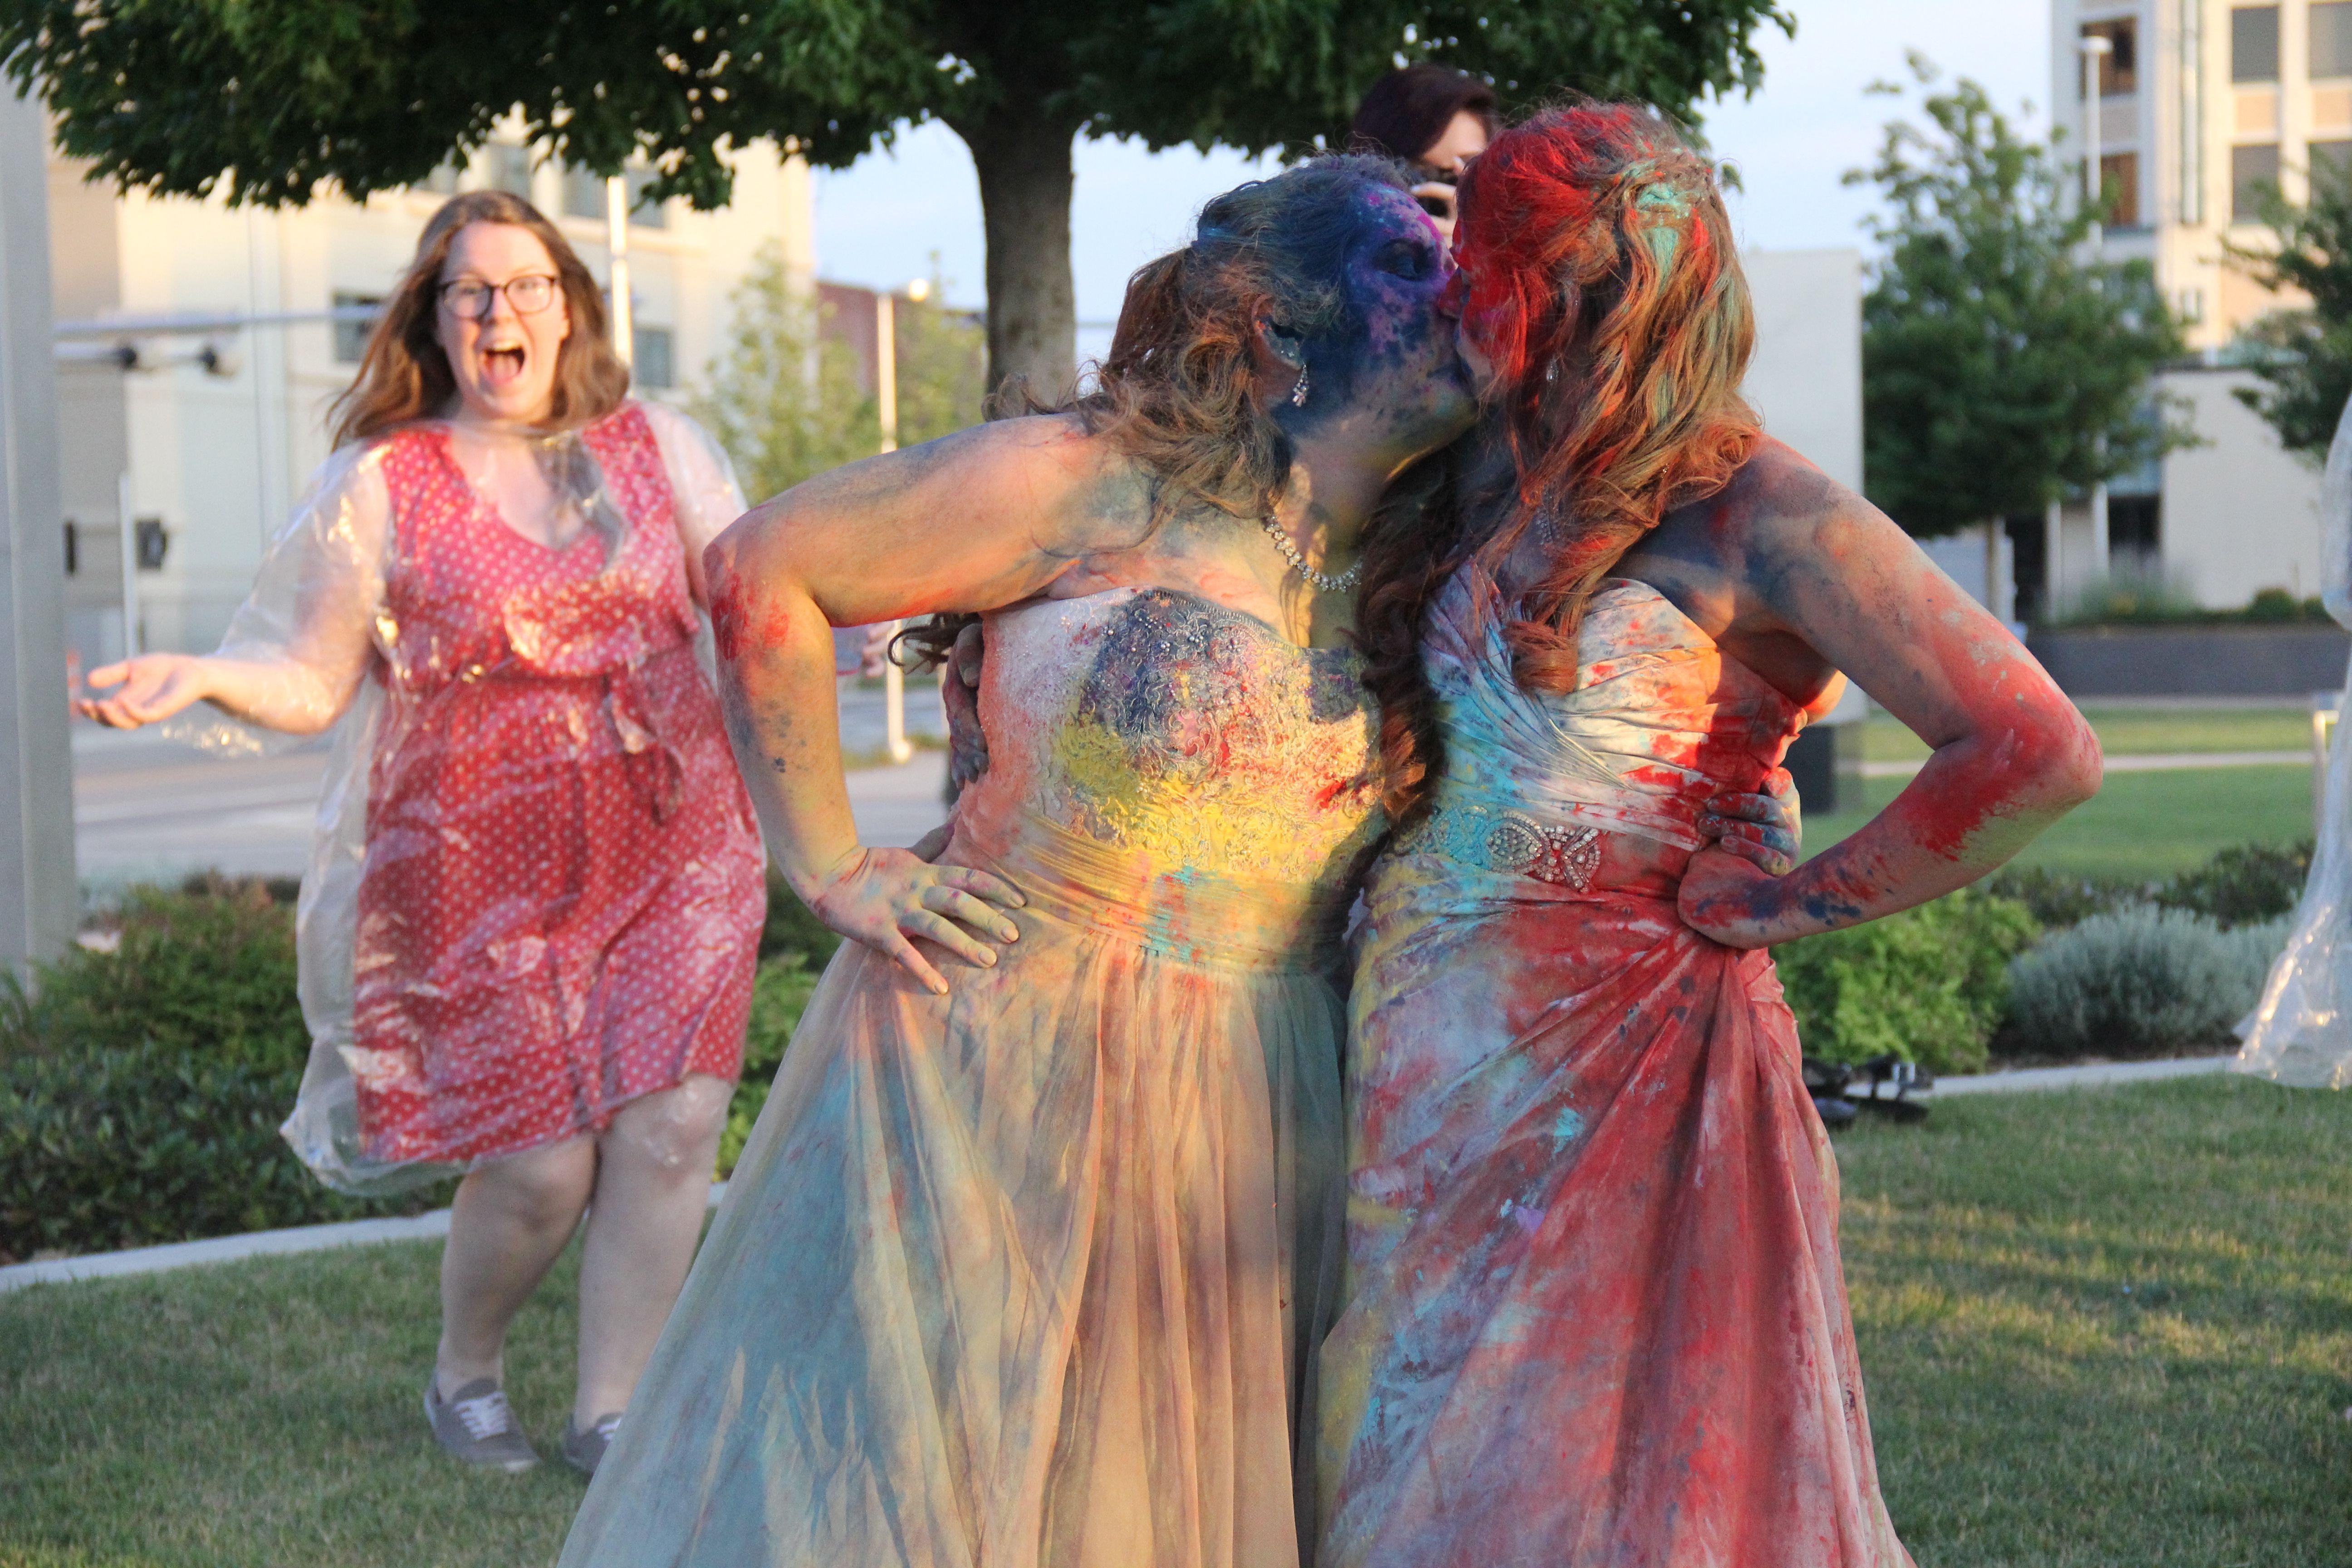 LGBTQ, Lesbian, Wedding, Holi, Powder, Same Love, OKC, Oklahoma City, trash the dress